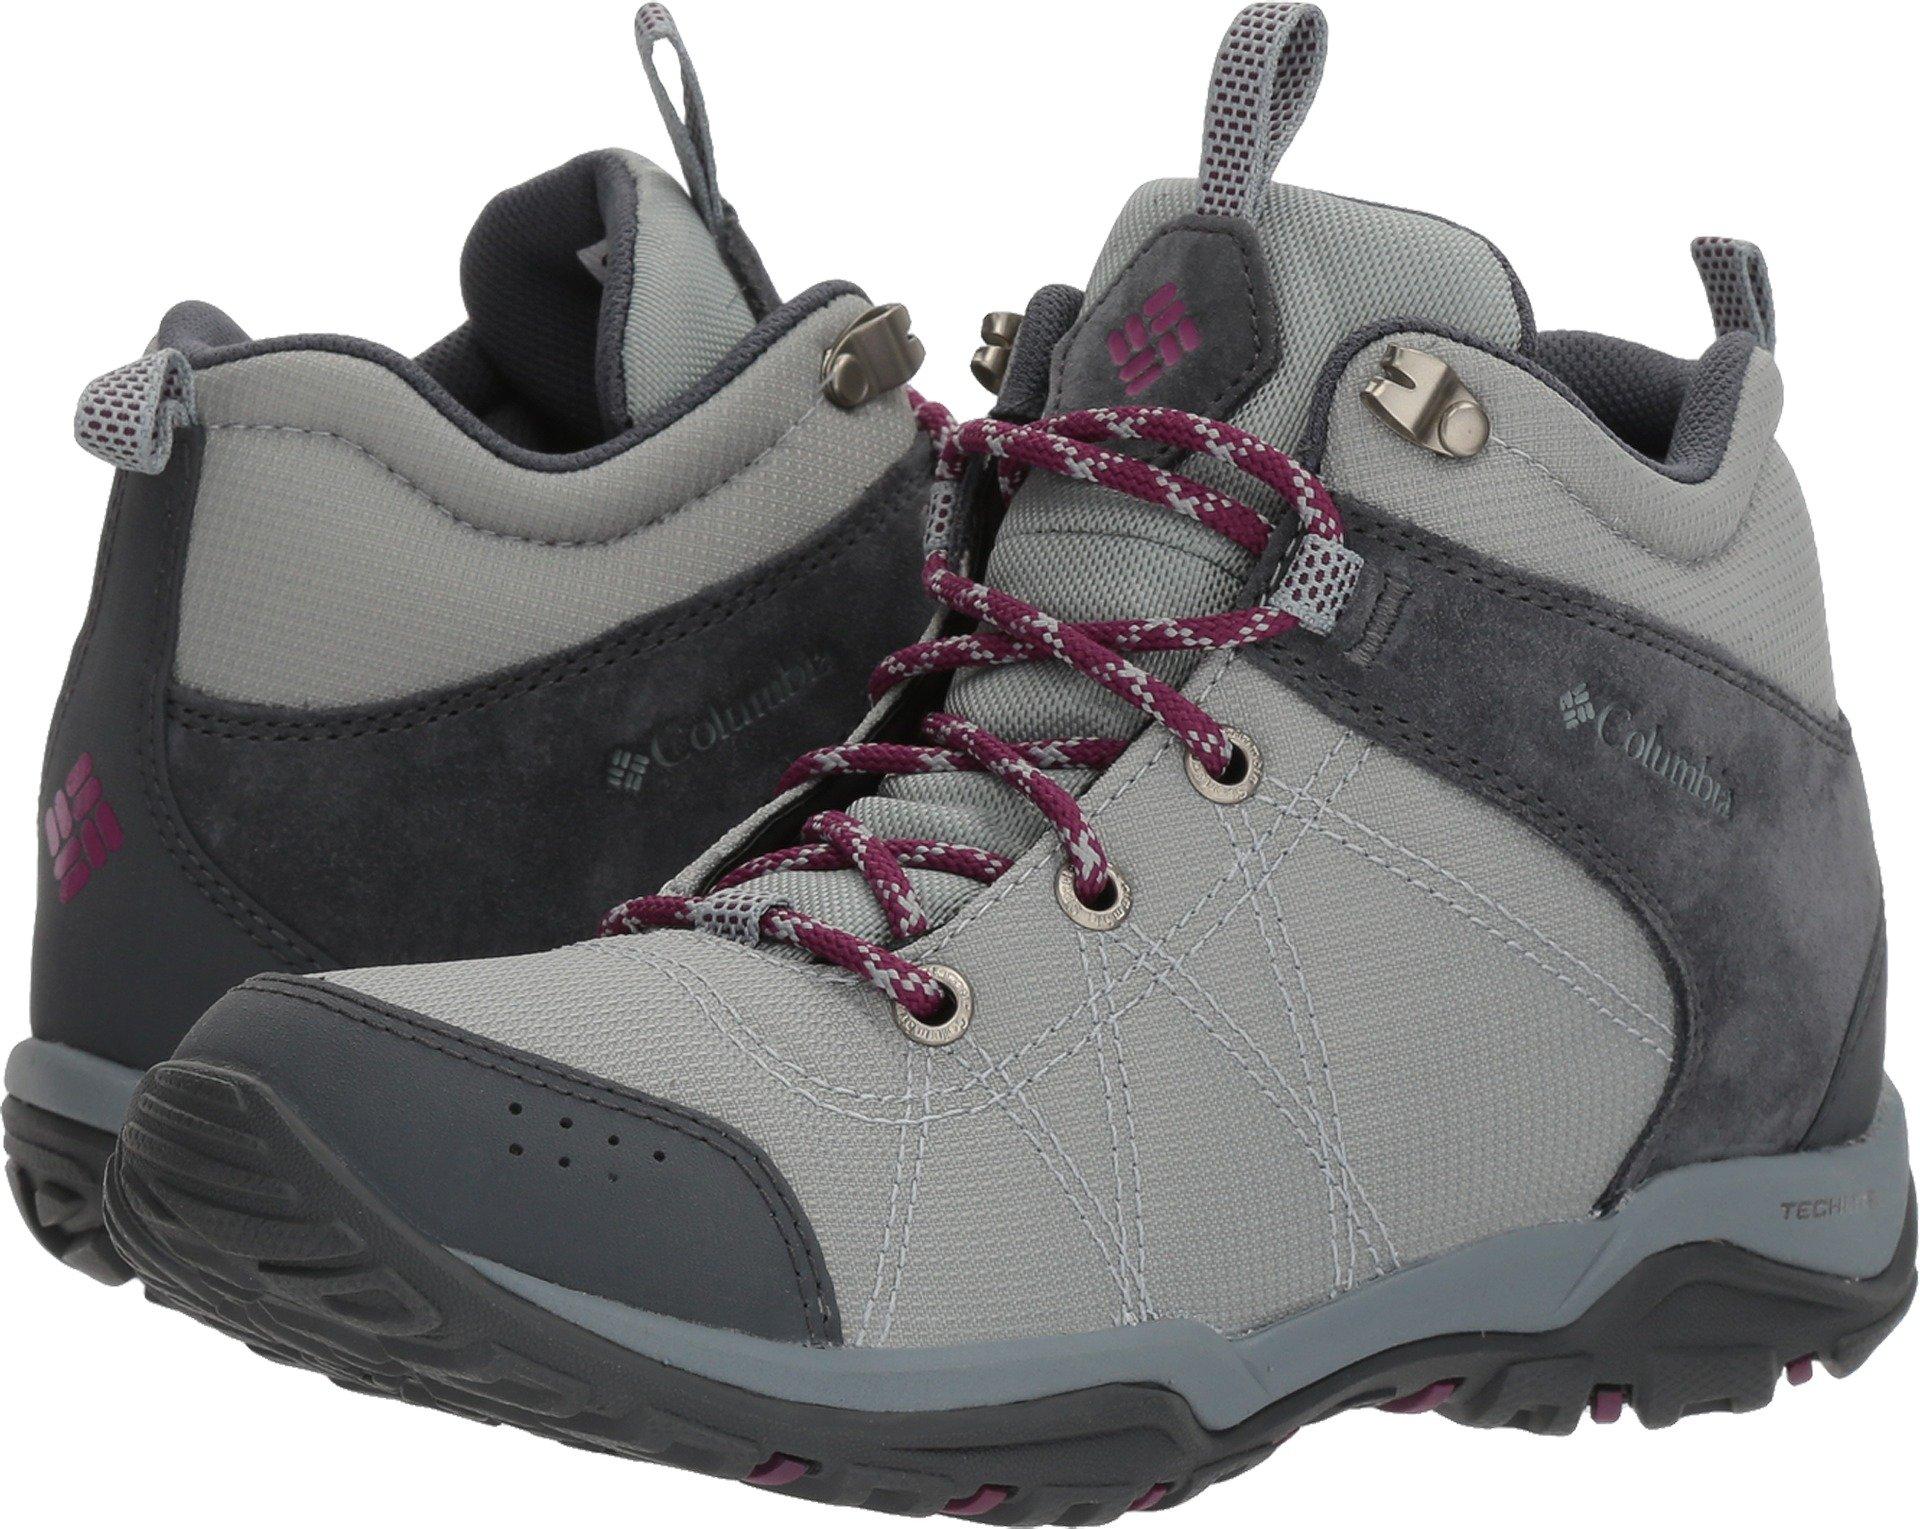 Columbia Women's Fire Venture Mid Textile Hiking Boot, Earl Grey, Dark Raspberry, 9.5 Regular US